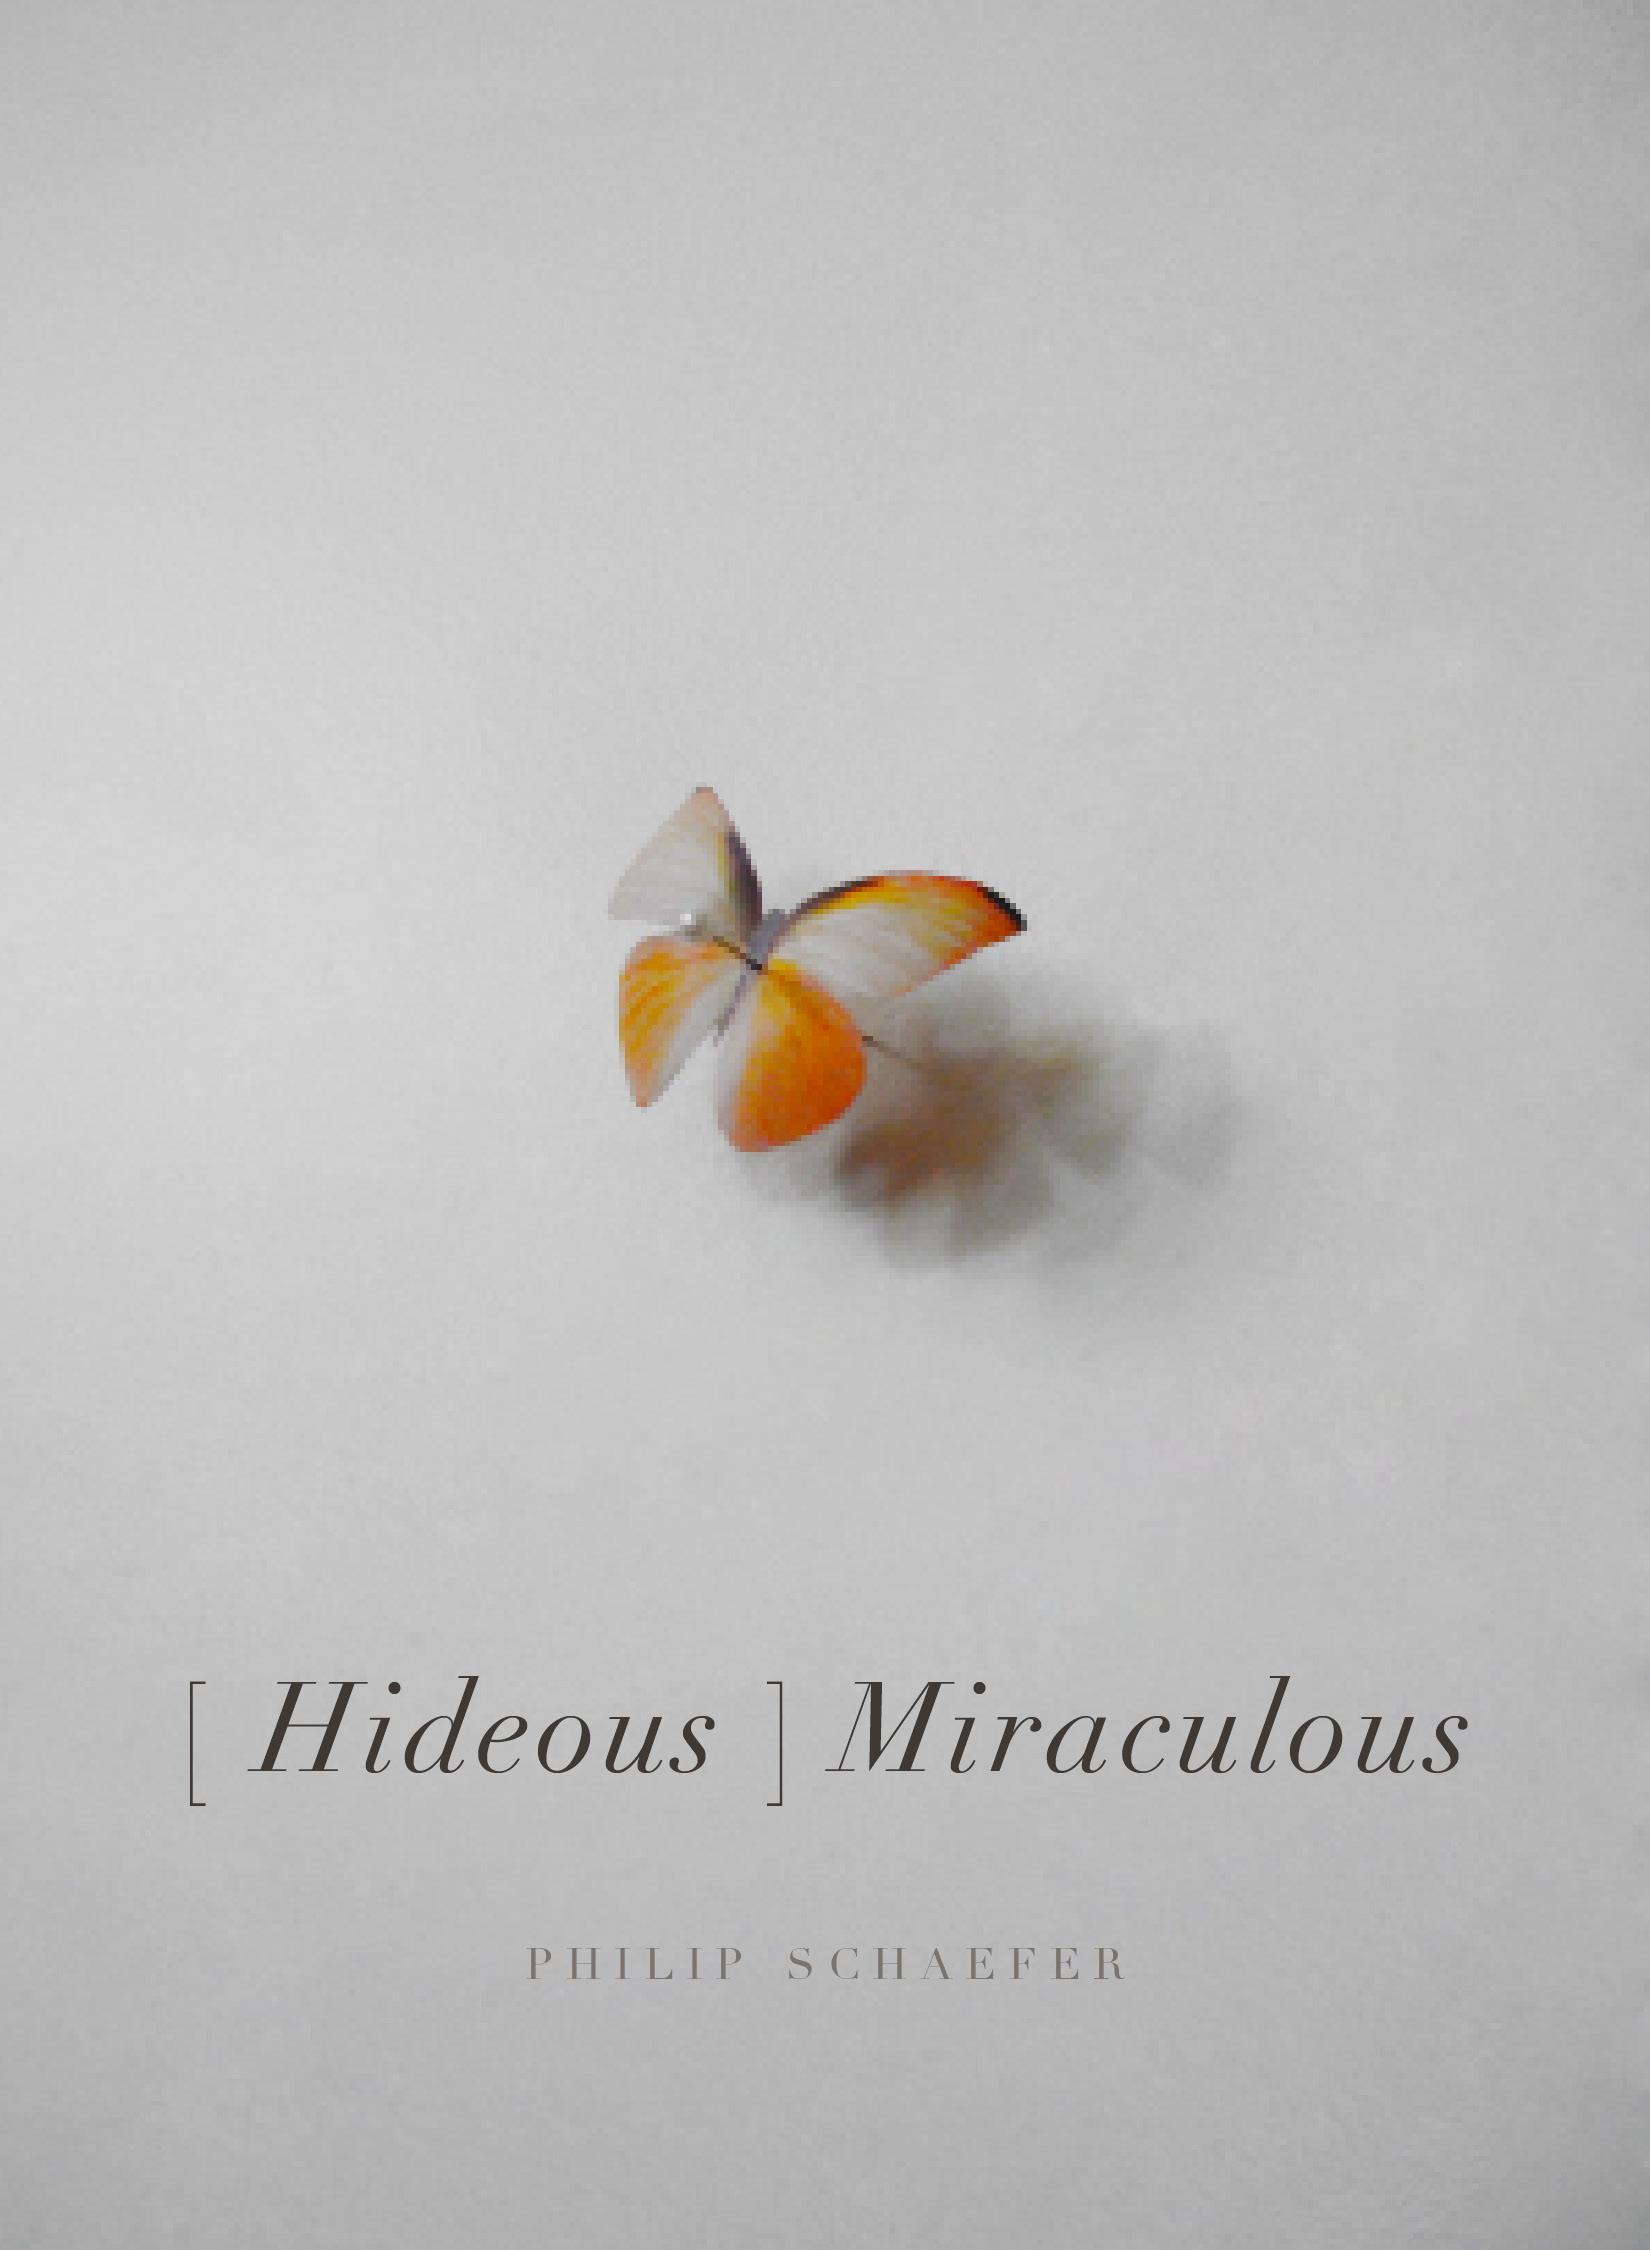 [Hideous] Miraculous by Philip Schaefer (BOAAT Press, 2015) |  Full PDF